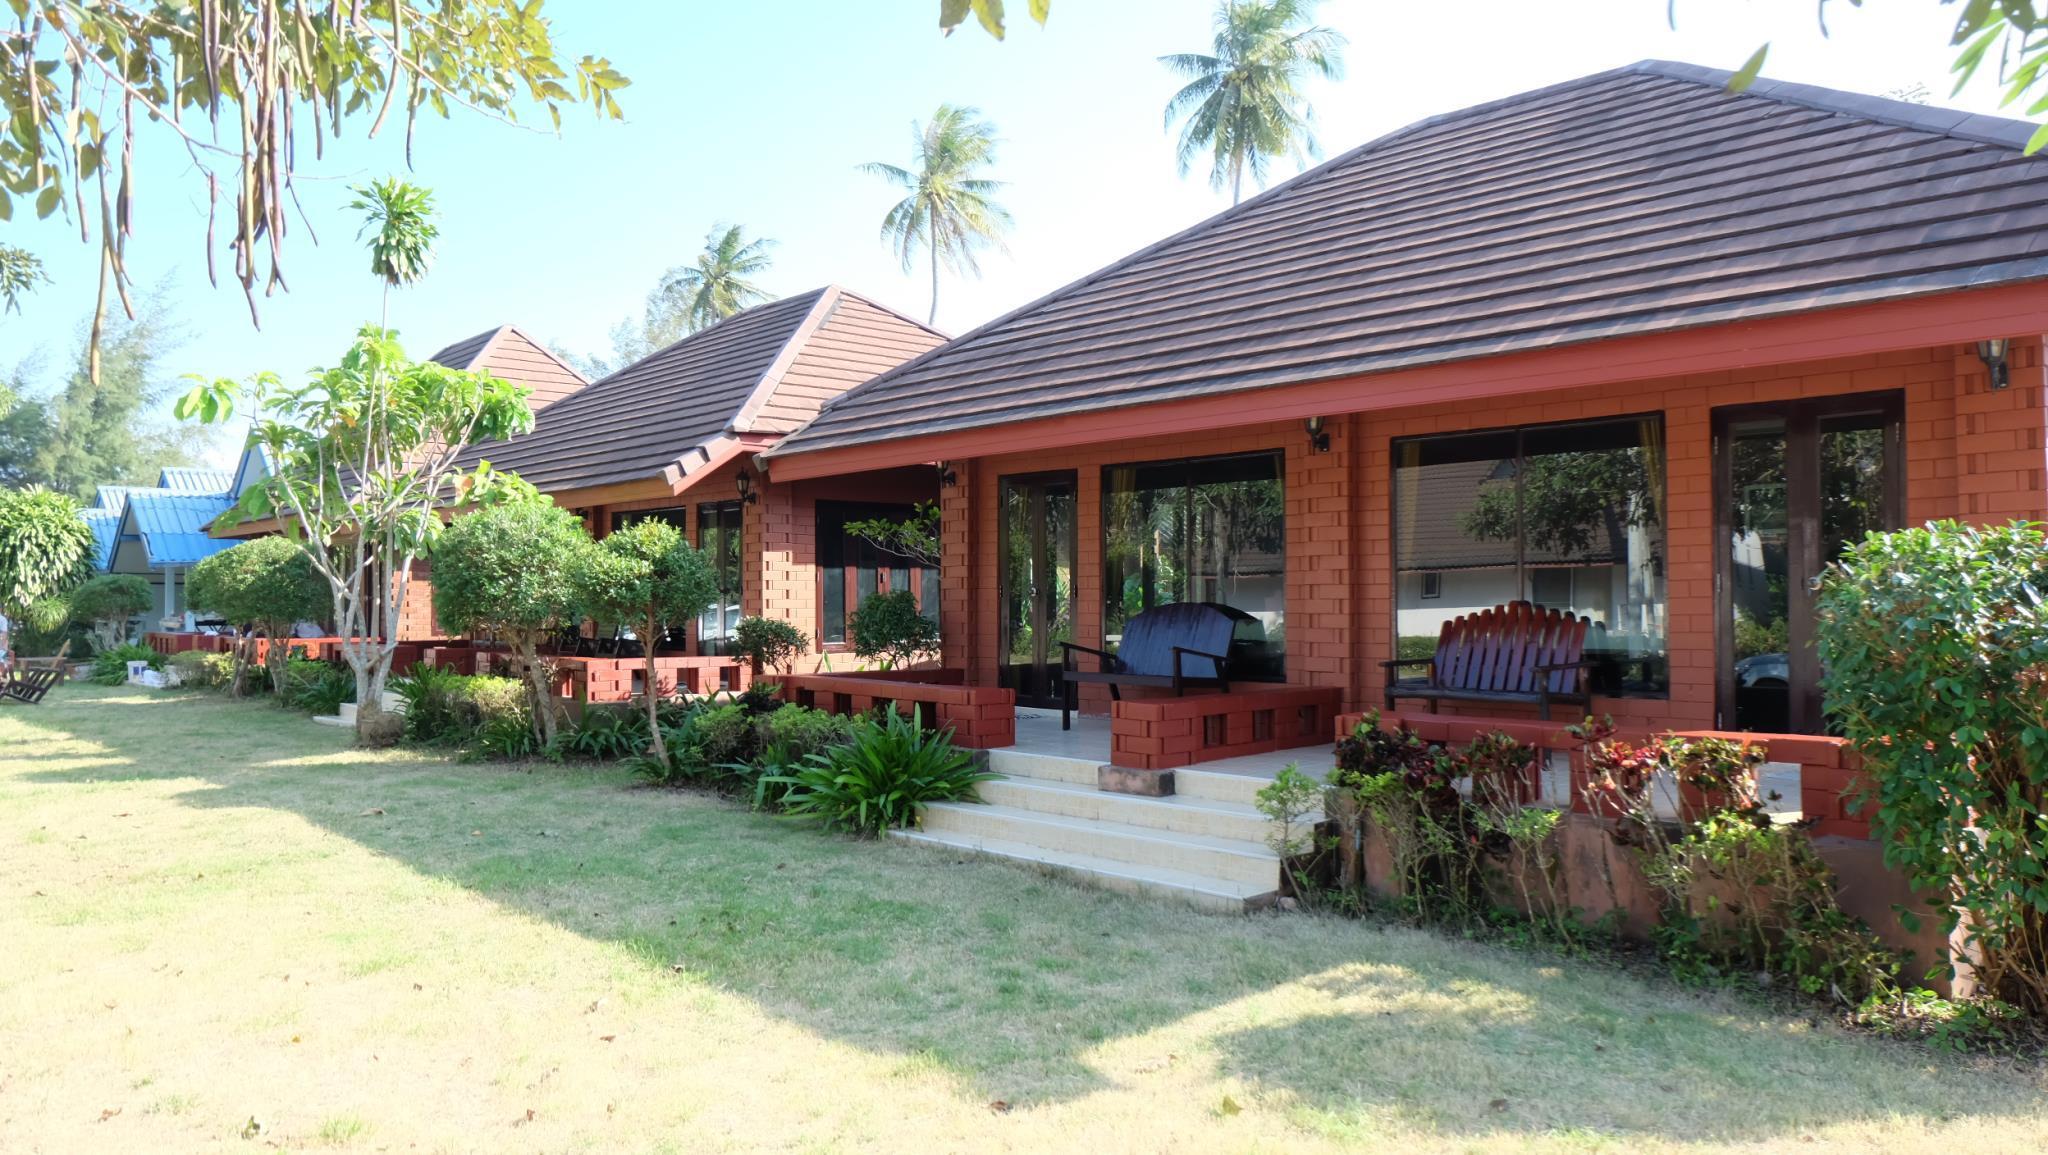 Suan Luang Beach Resort,Suan Luang Beach Resort